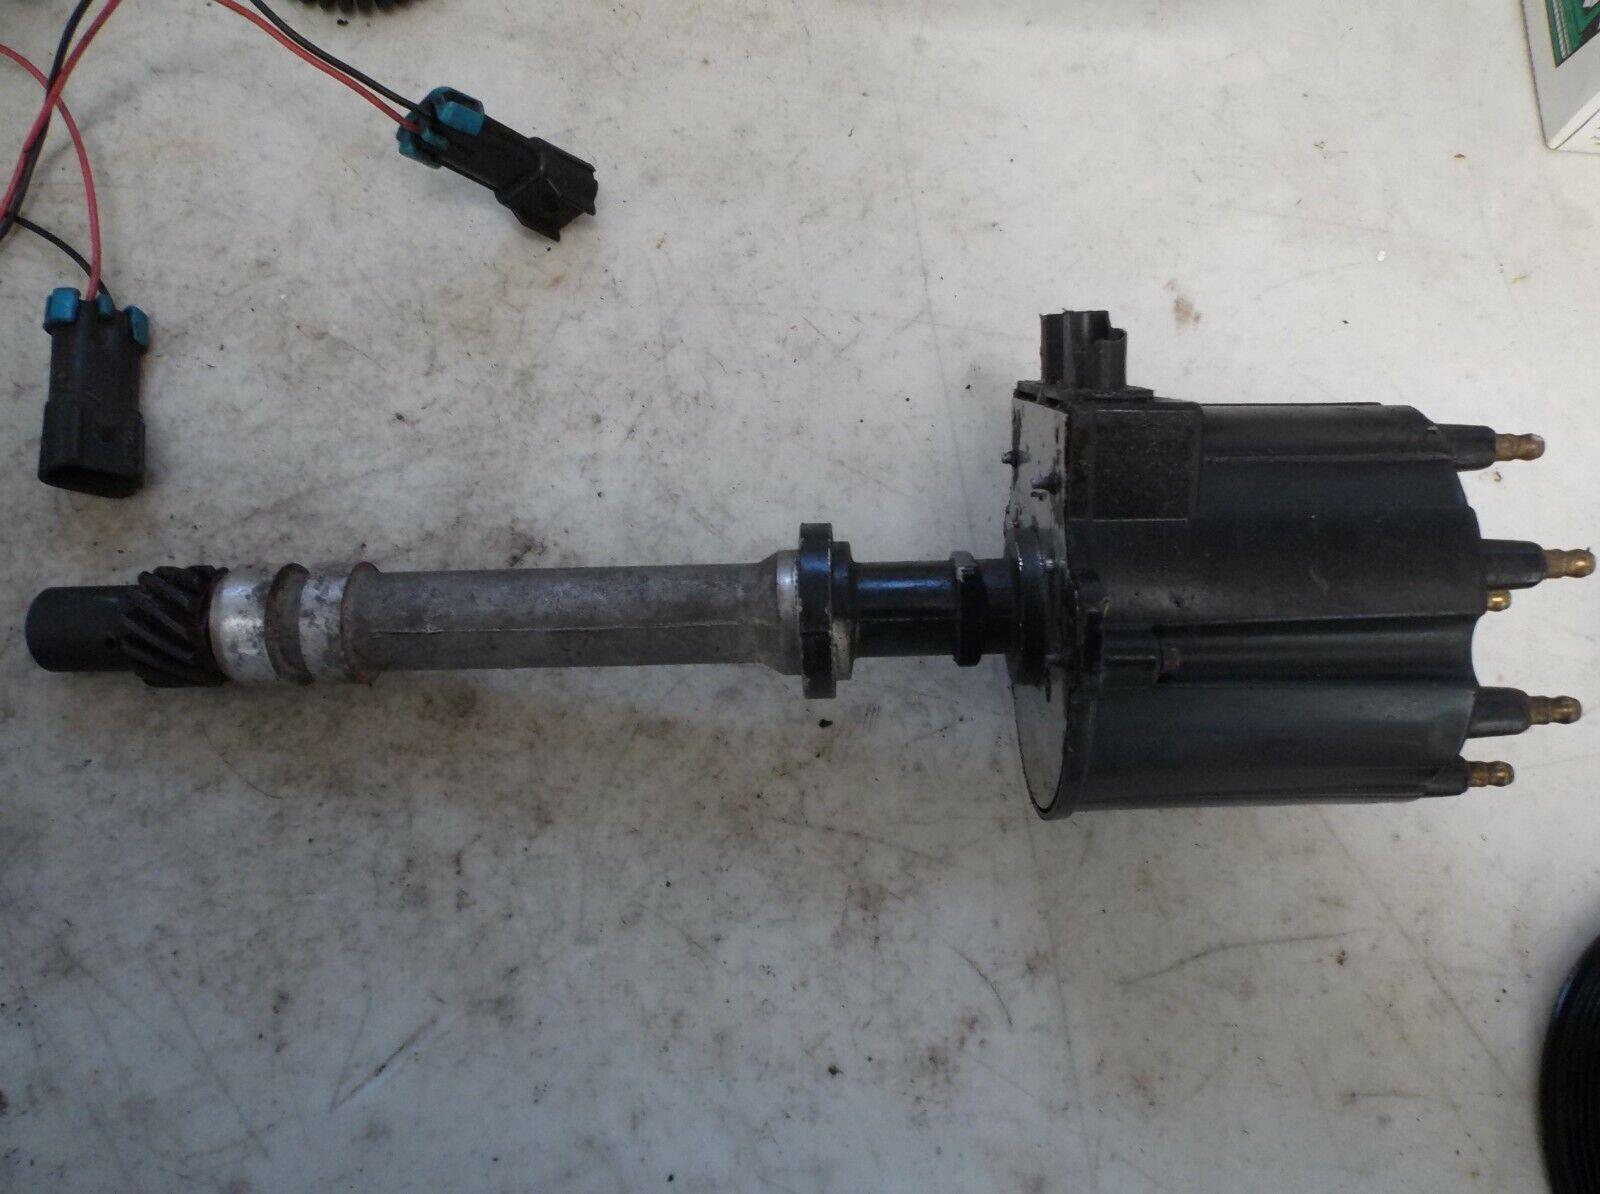 Mercruiser Marine Gm Distributor V8 5.7L 1103799  3M20 - USED